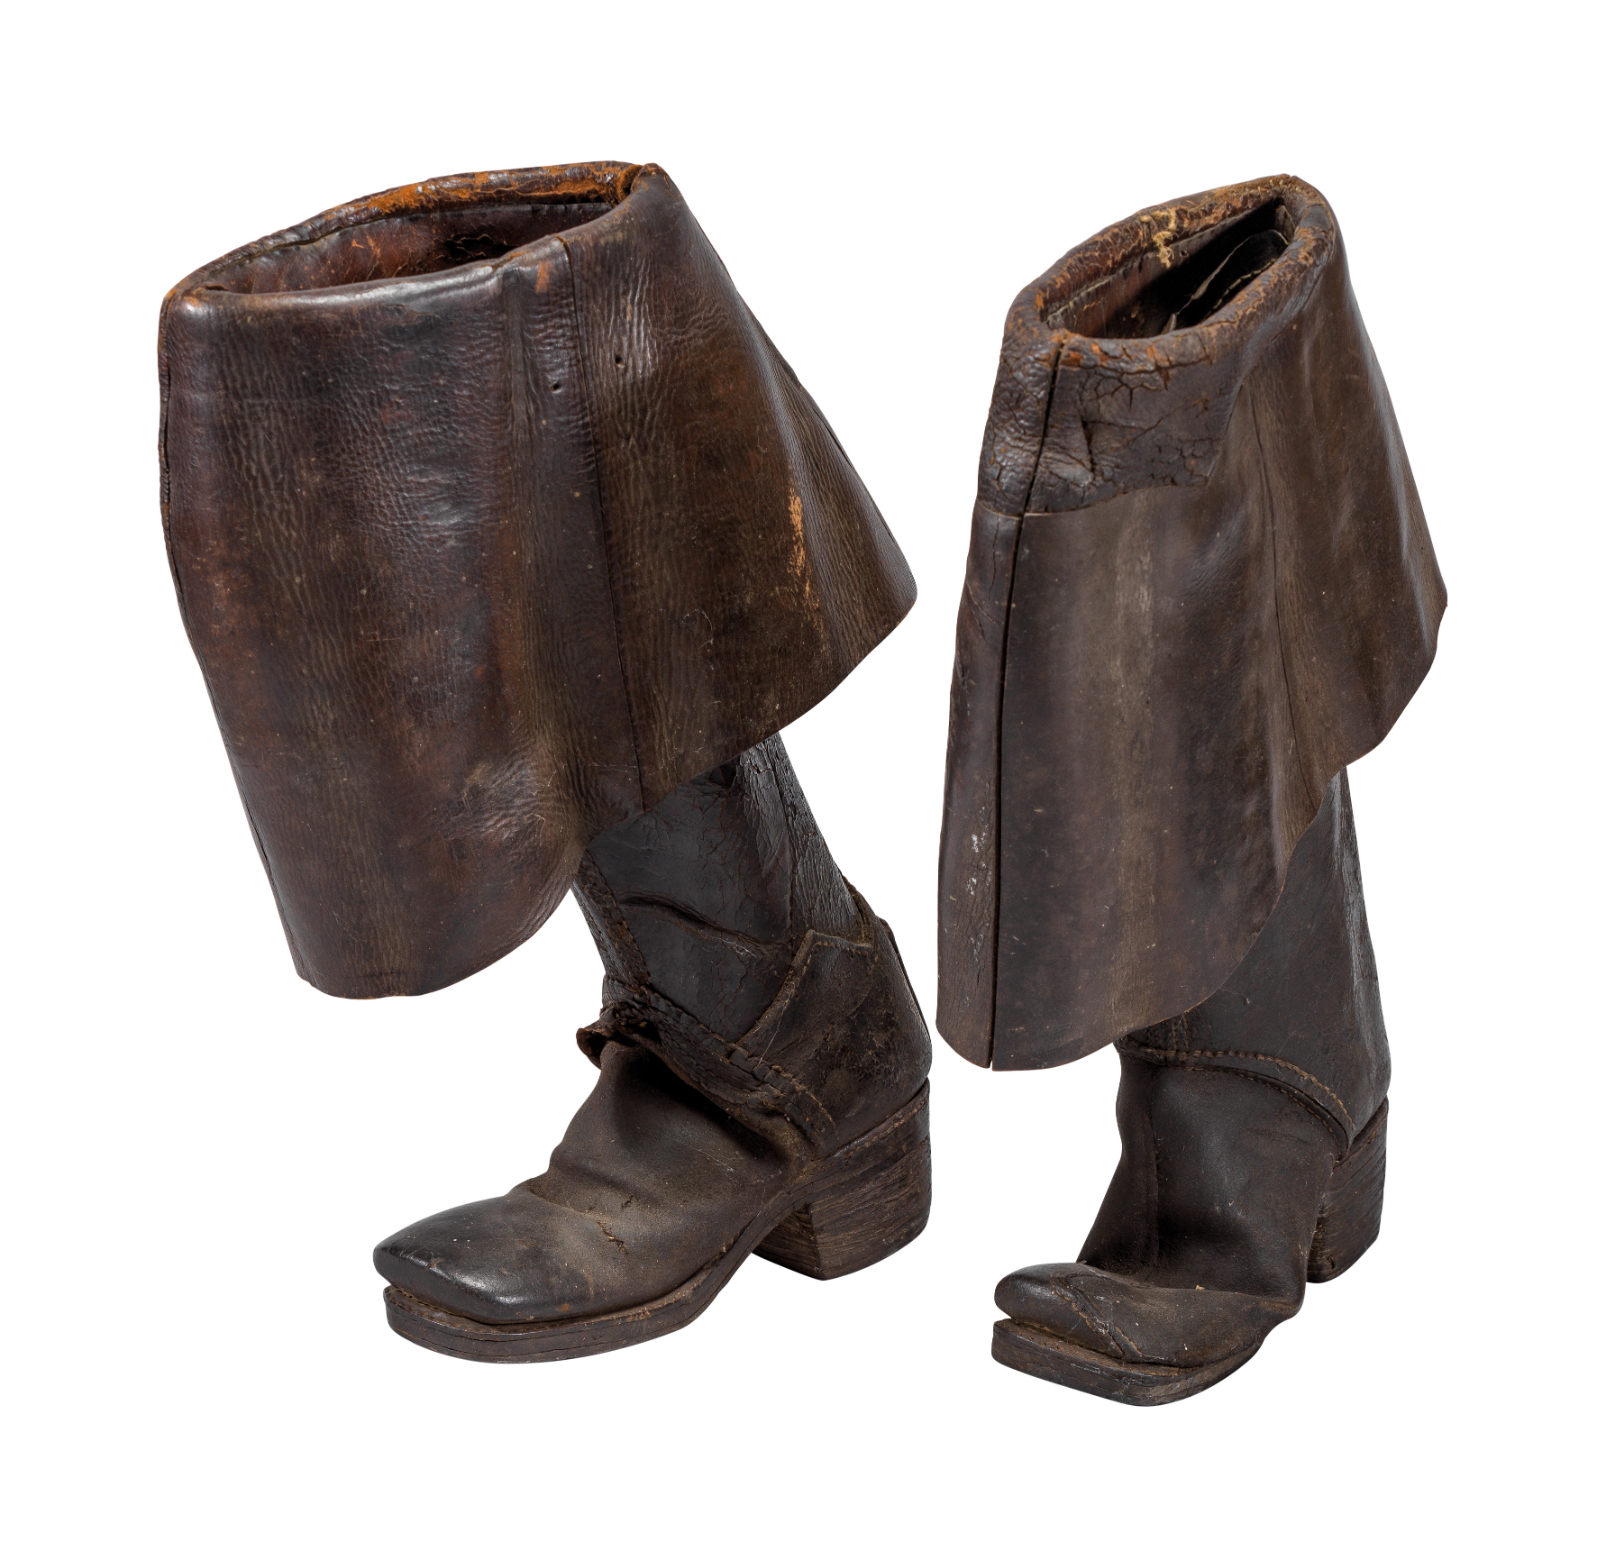 Ⓦ A PAIR OF ENGLISH HORSEMAN'S BOOTS^ CIRCA 1700